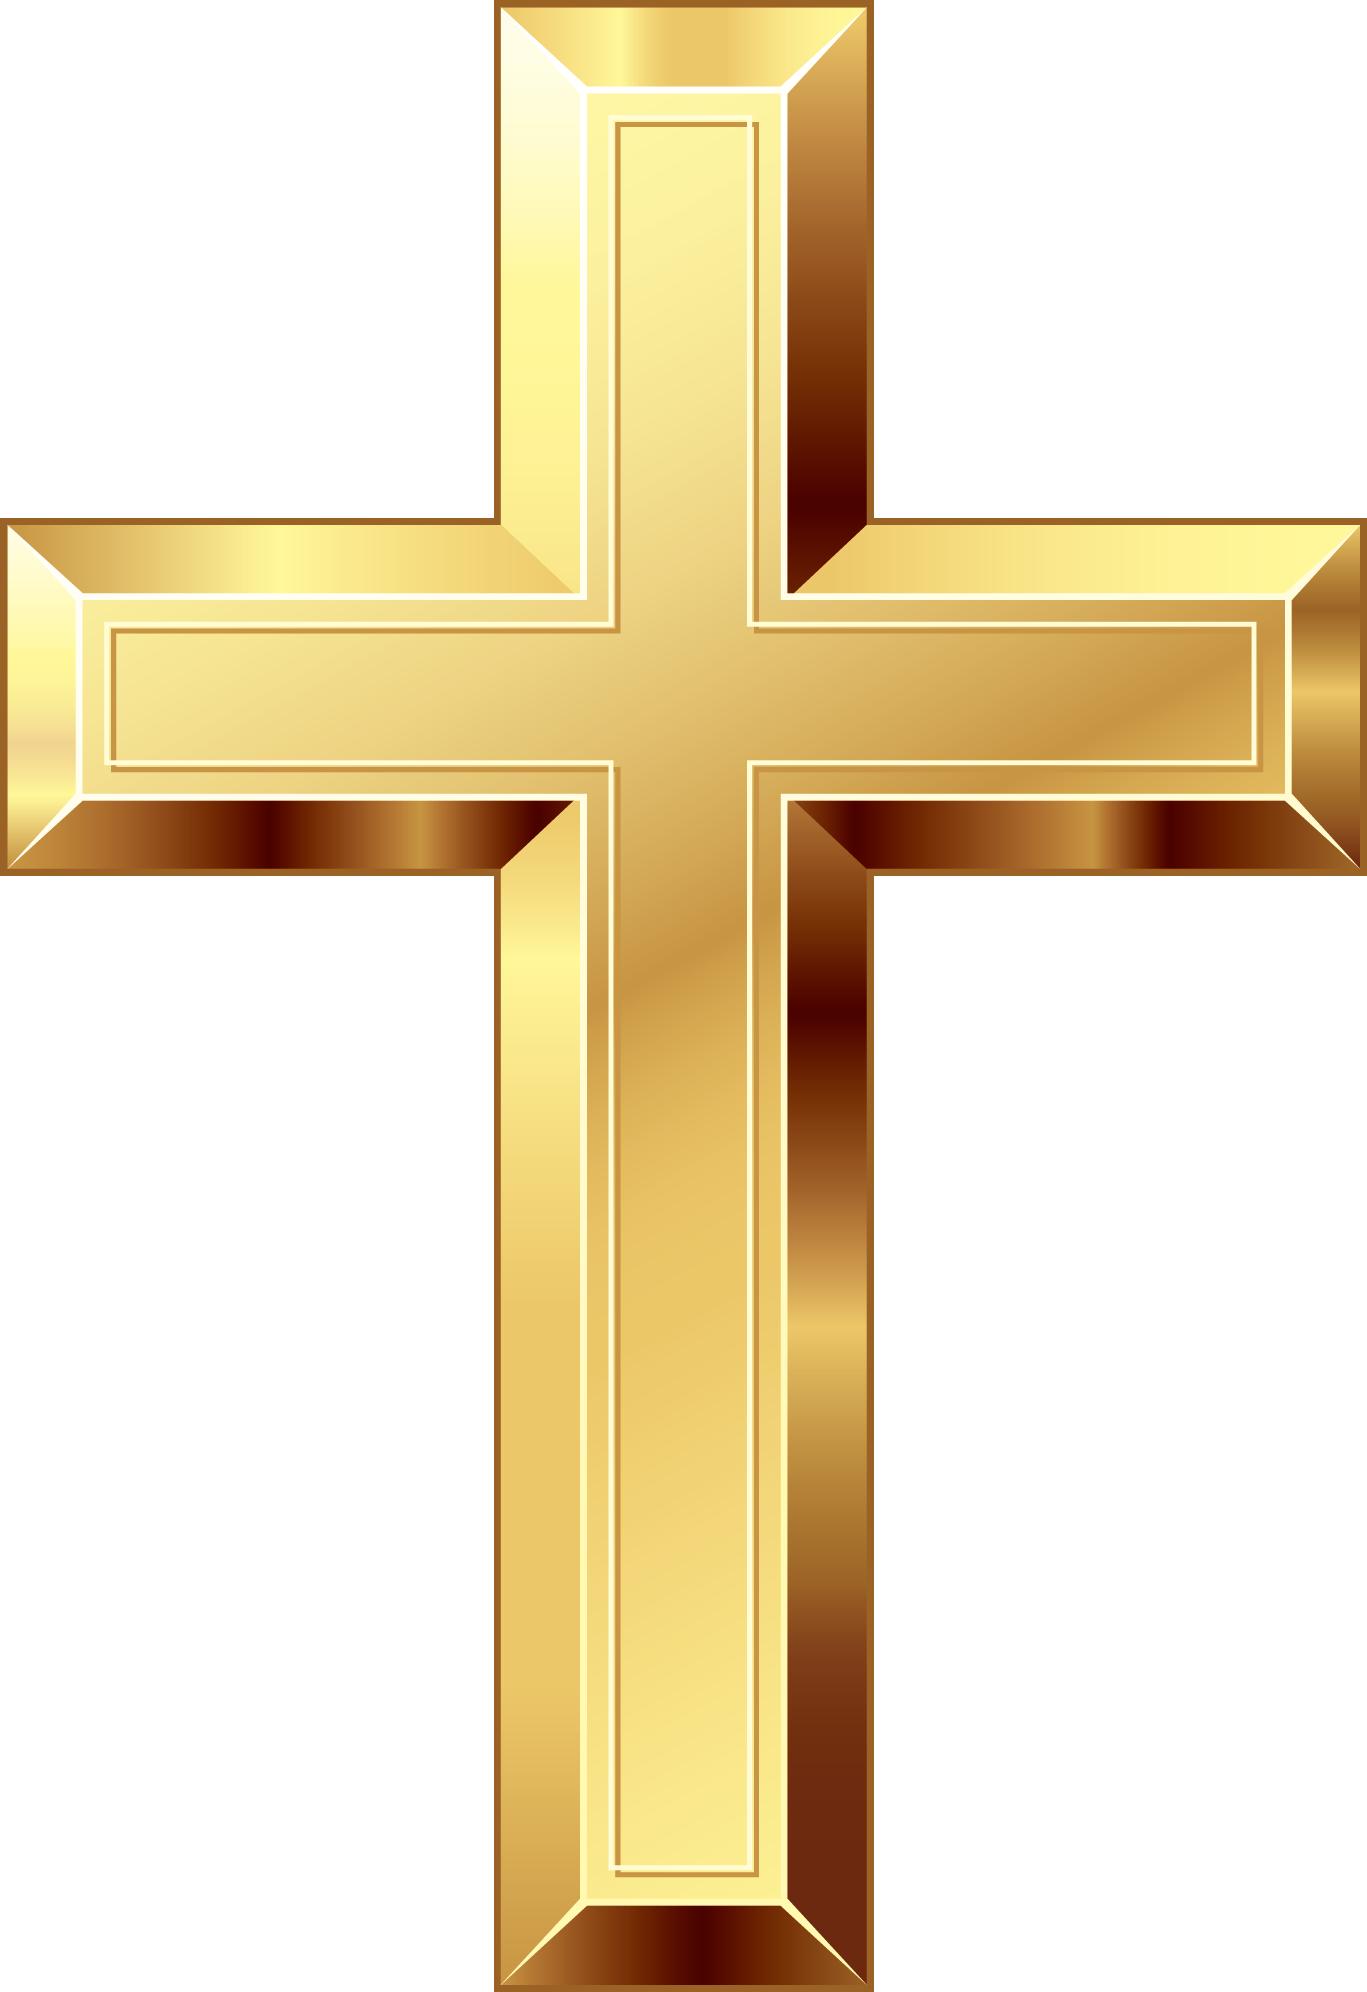 Cross_AdobeStock_71977554 [Converted]